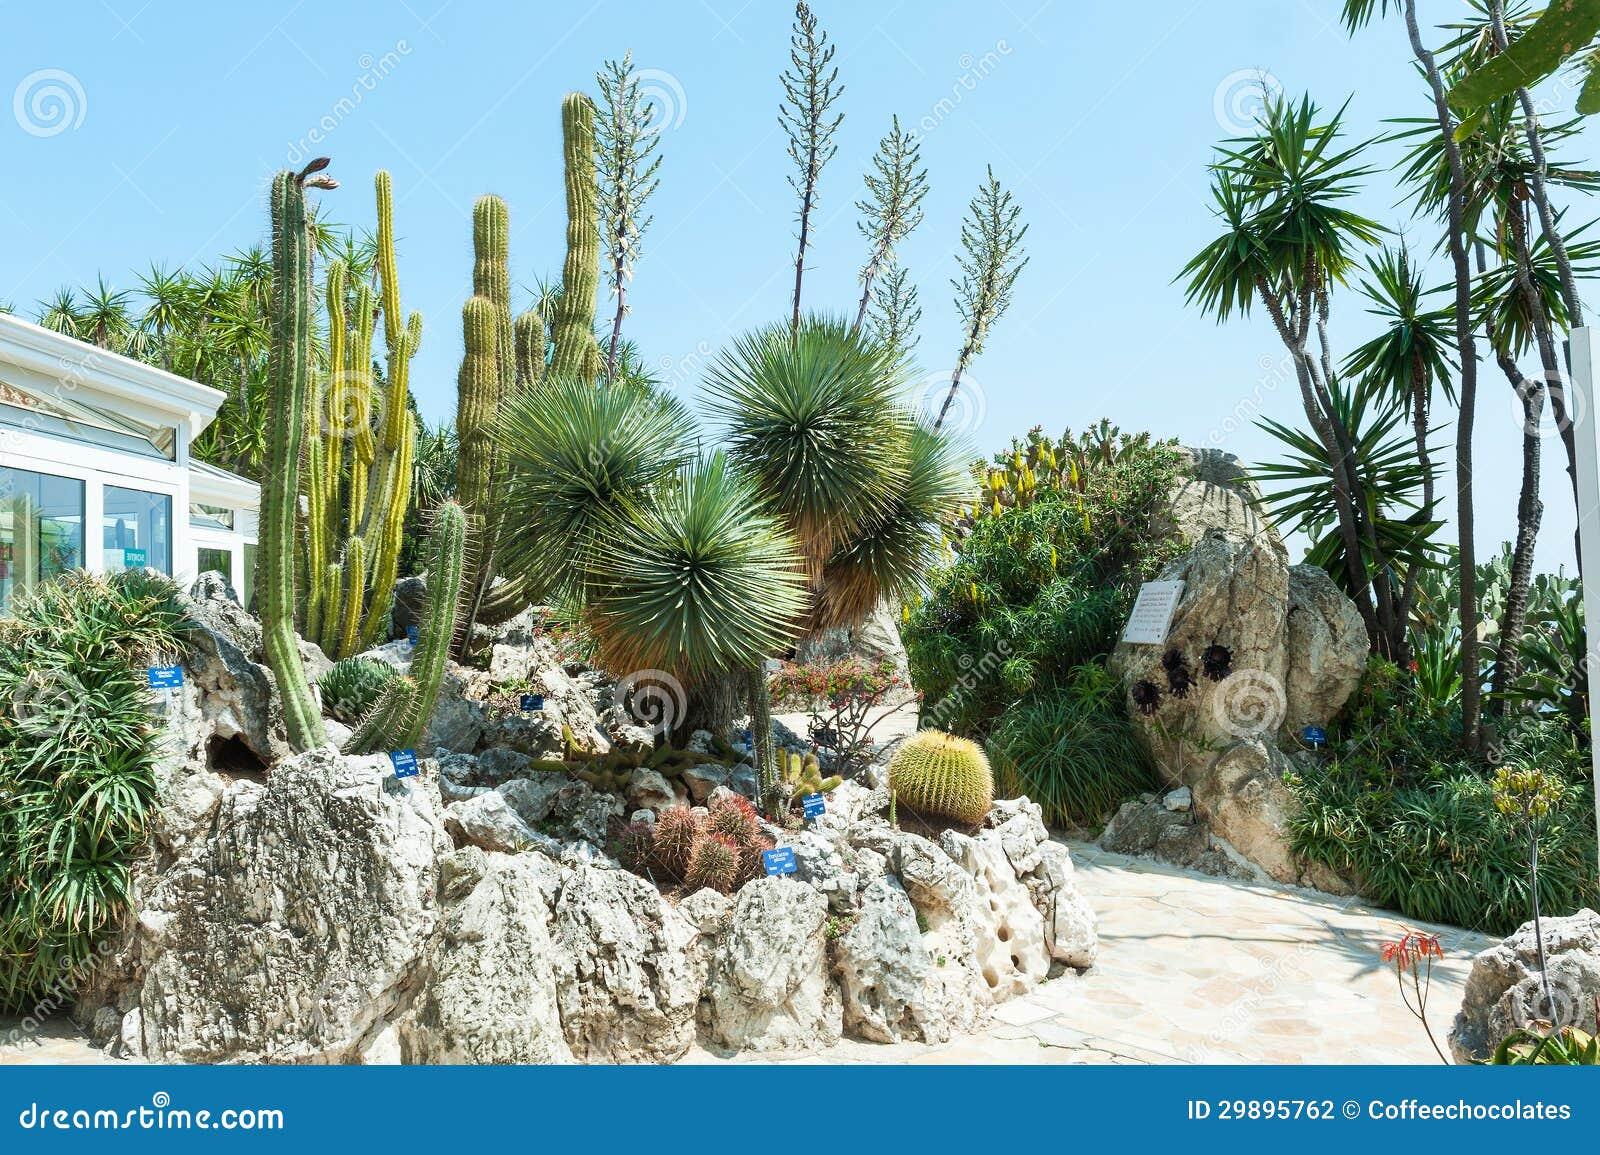 Garden cacti and succulents in monaco stock photo image for Jardines con cactus